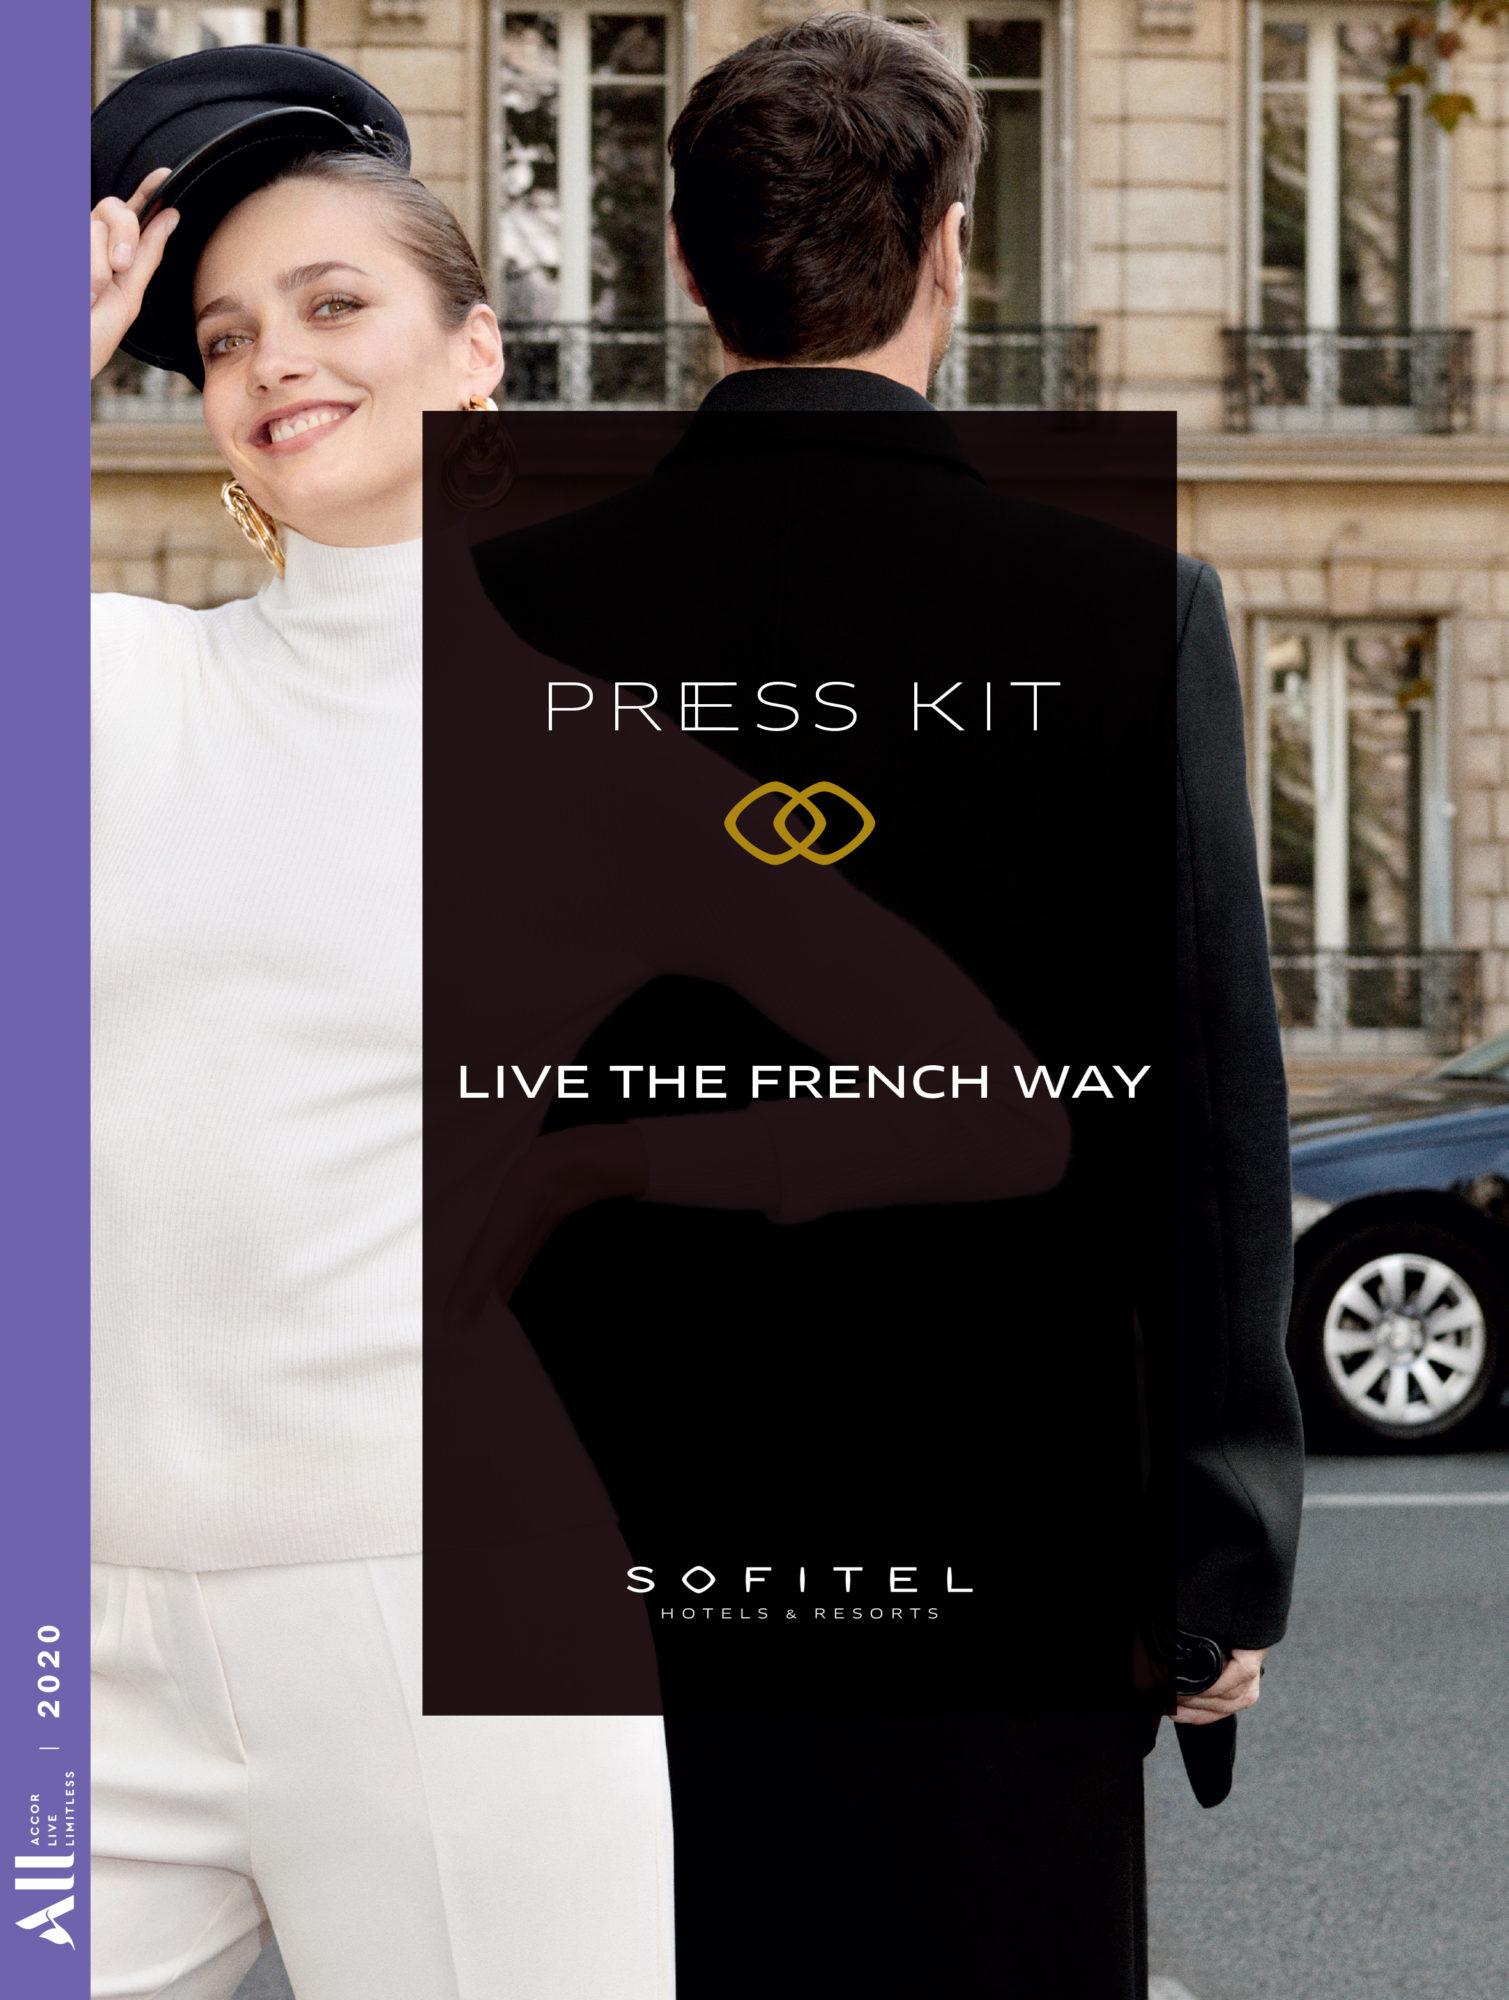 Sofitel press kit